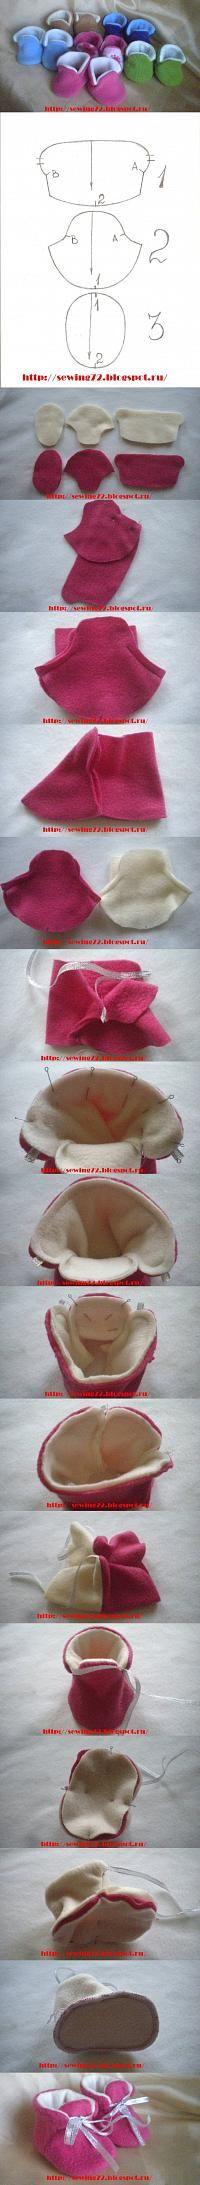 DIY Home and Crafts: DIY Fleece Booties DIY Projects   UsefulDIY.com - DIY Refashion